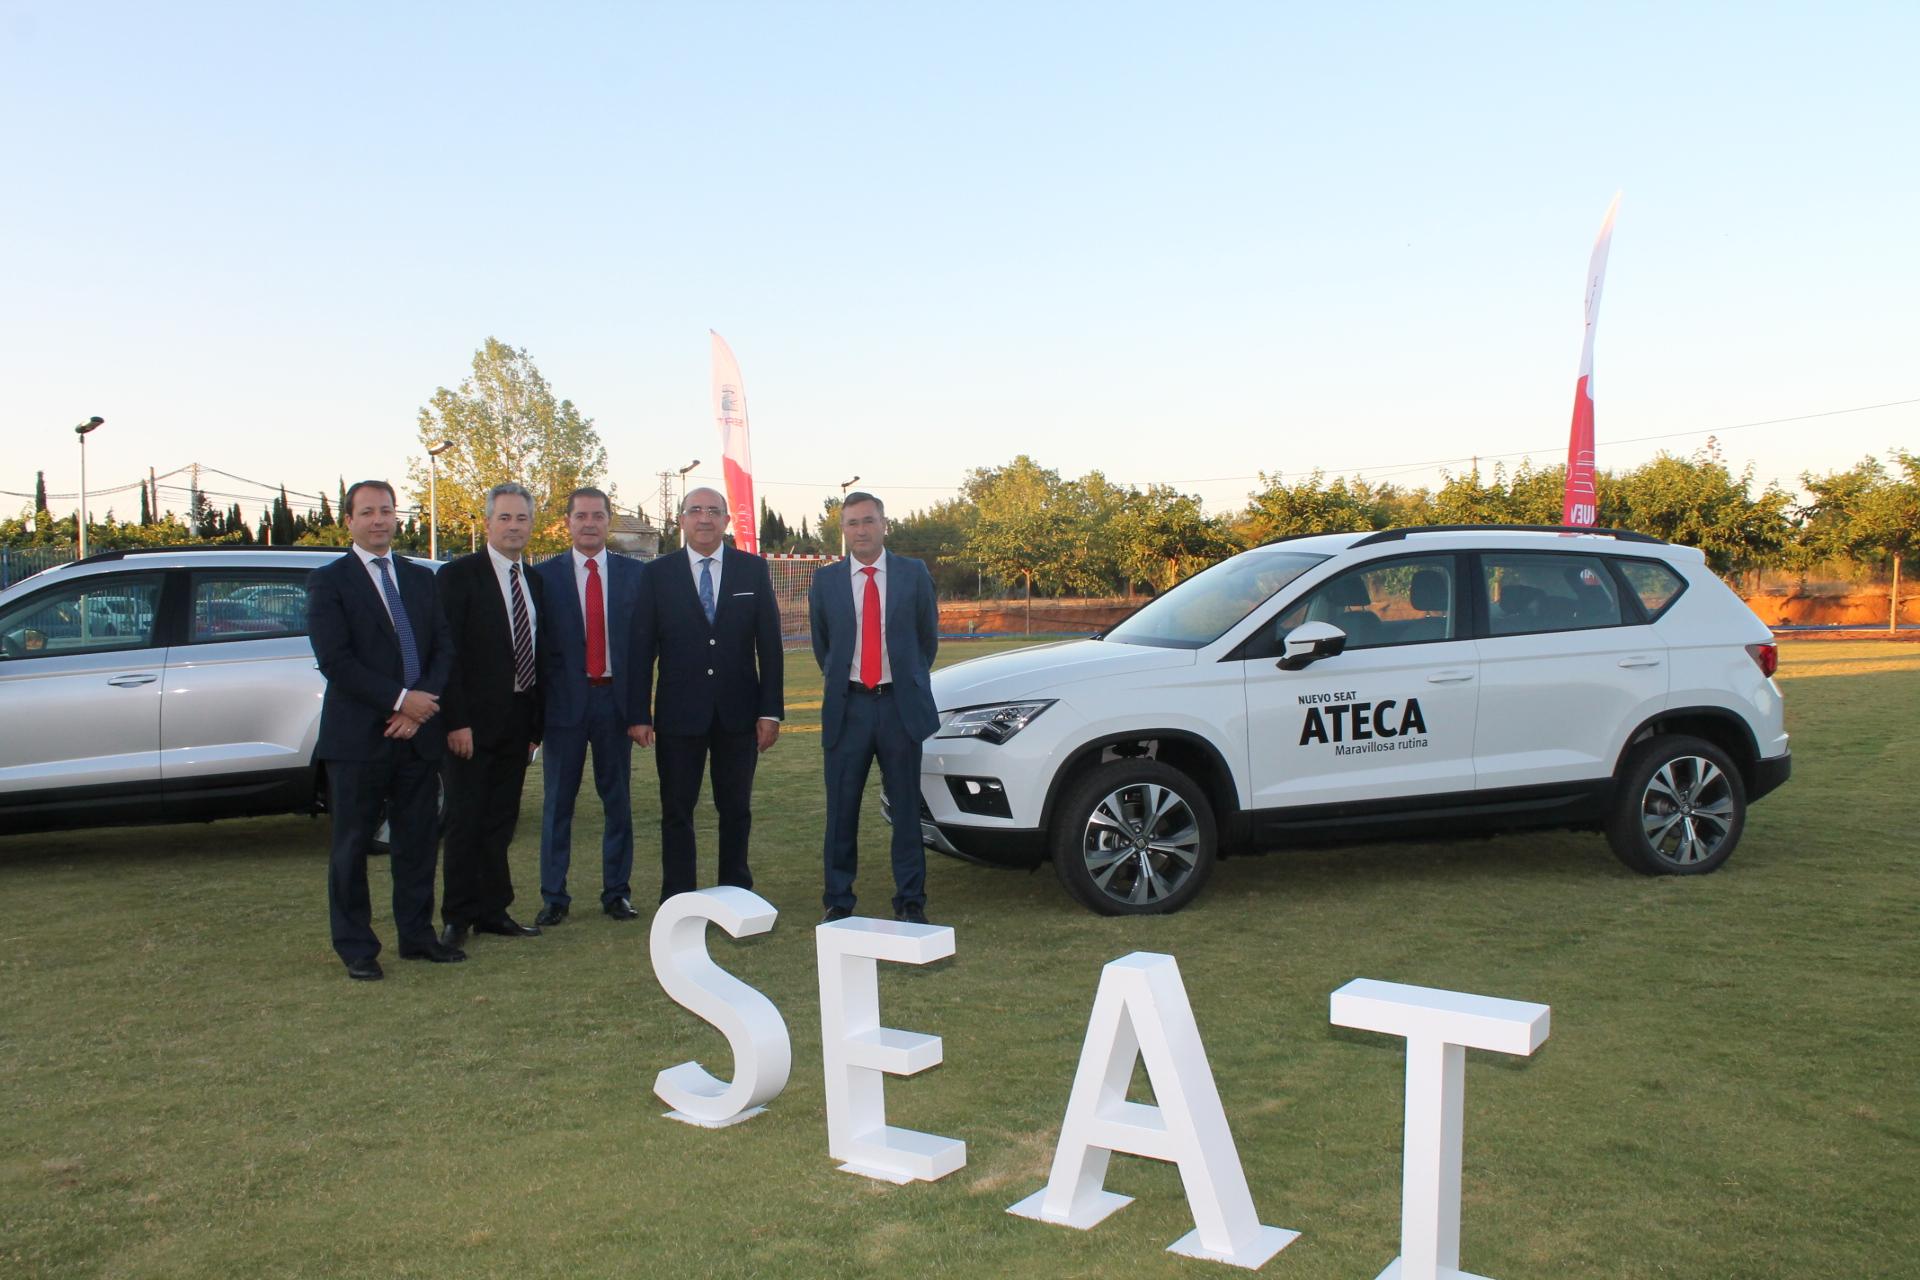 Comatur presentó el Nuevo SEAT Ateca